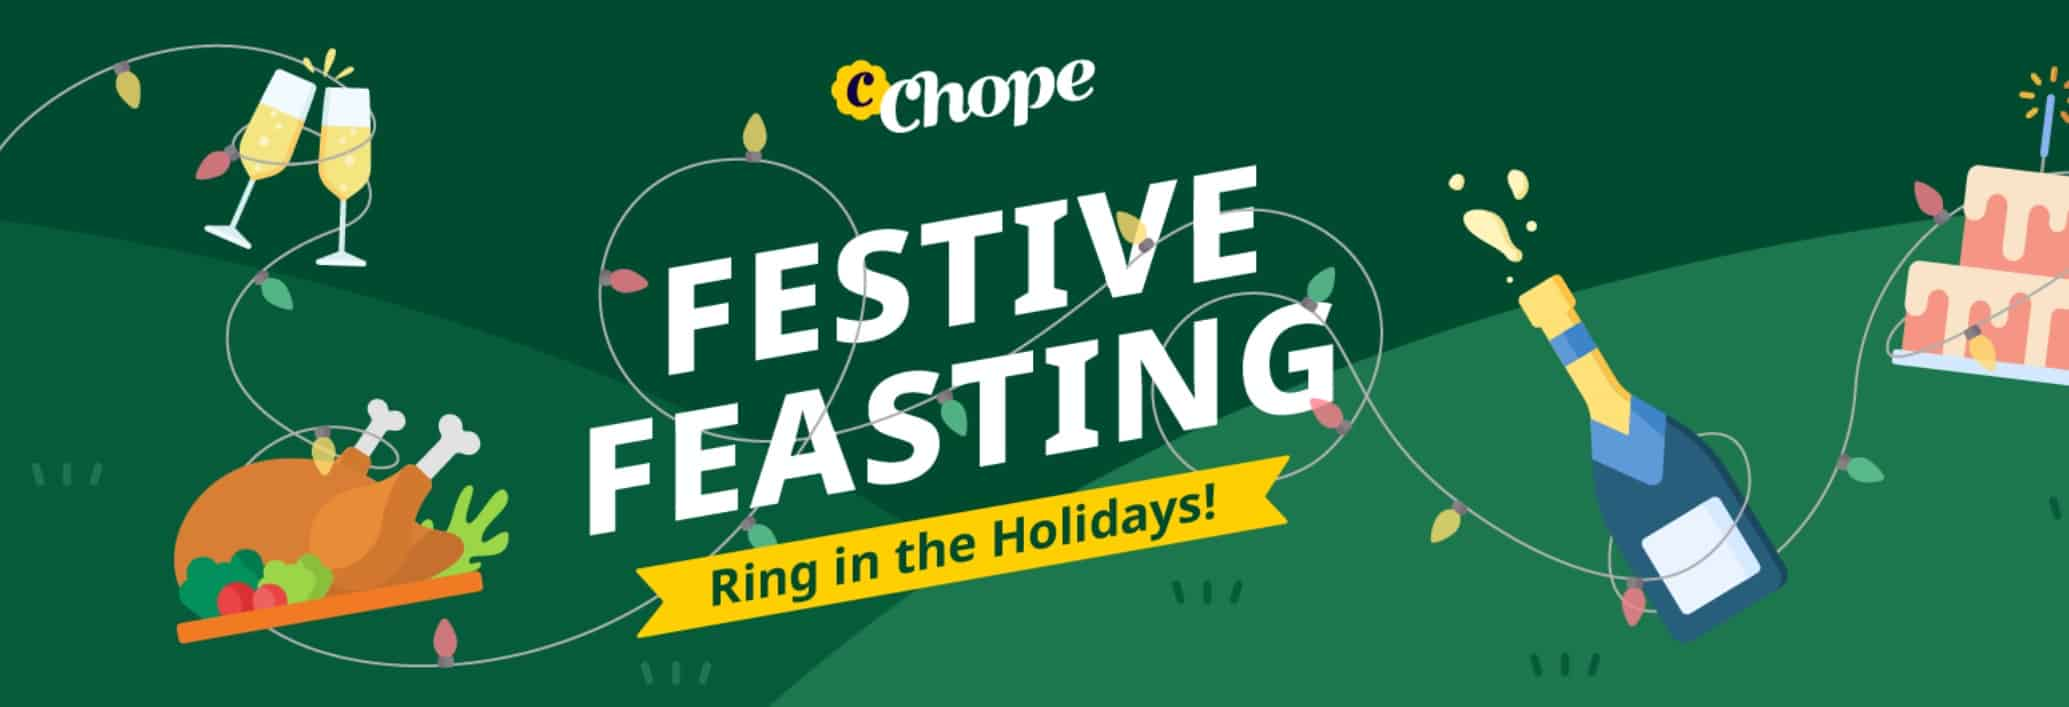 Chope Christmas Festive 2020